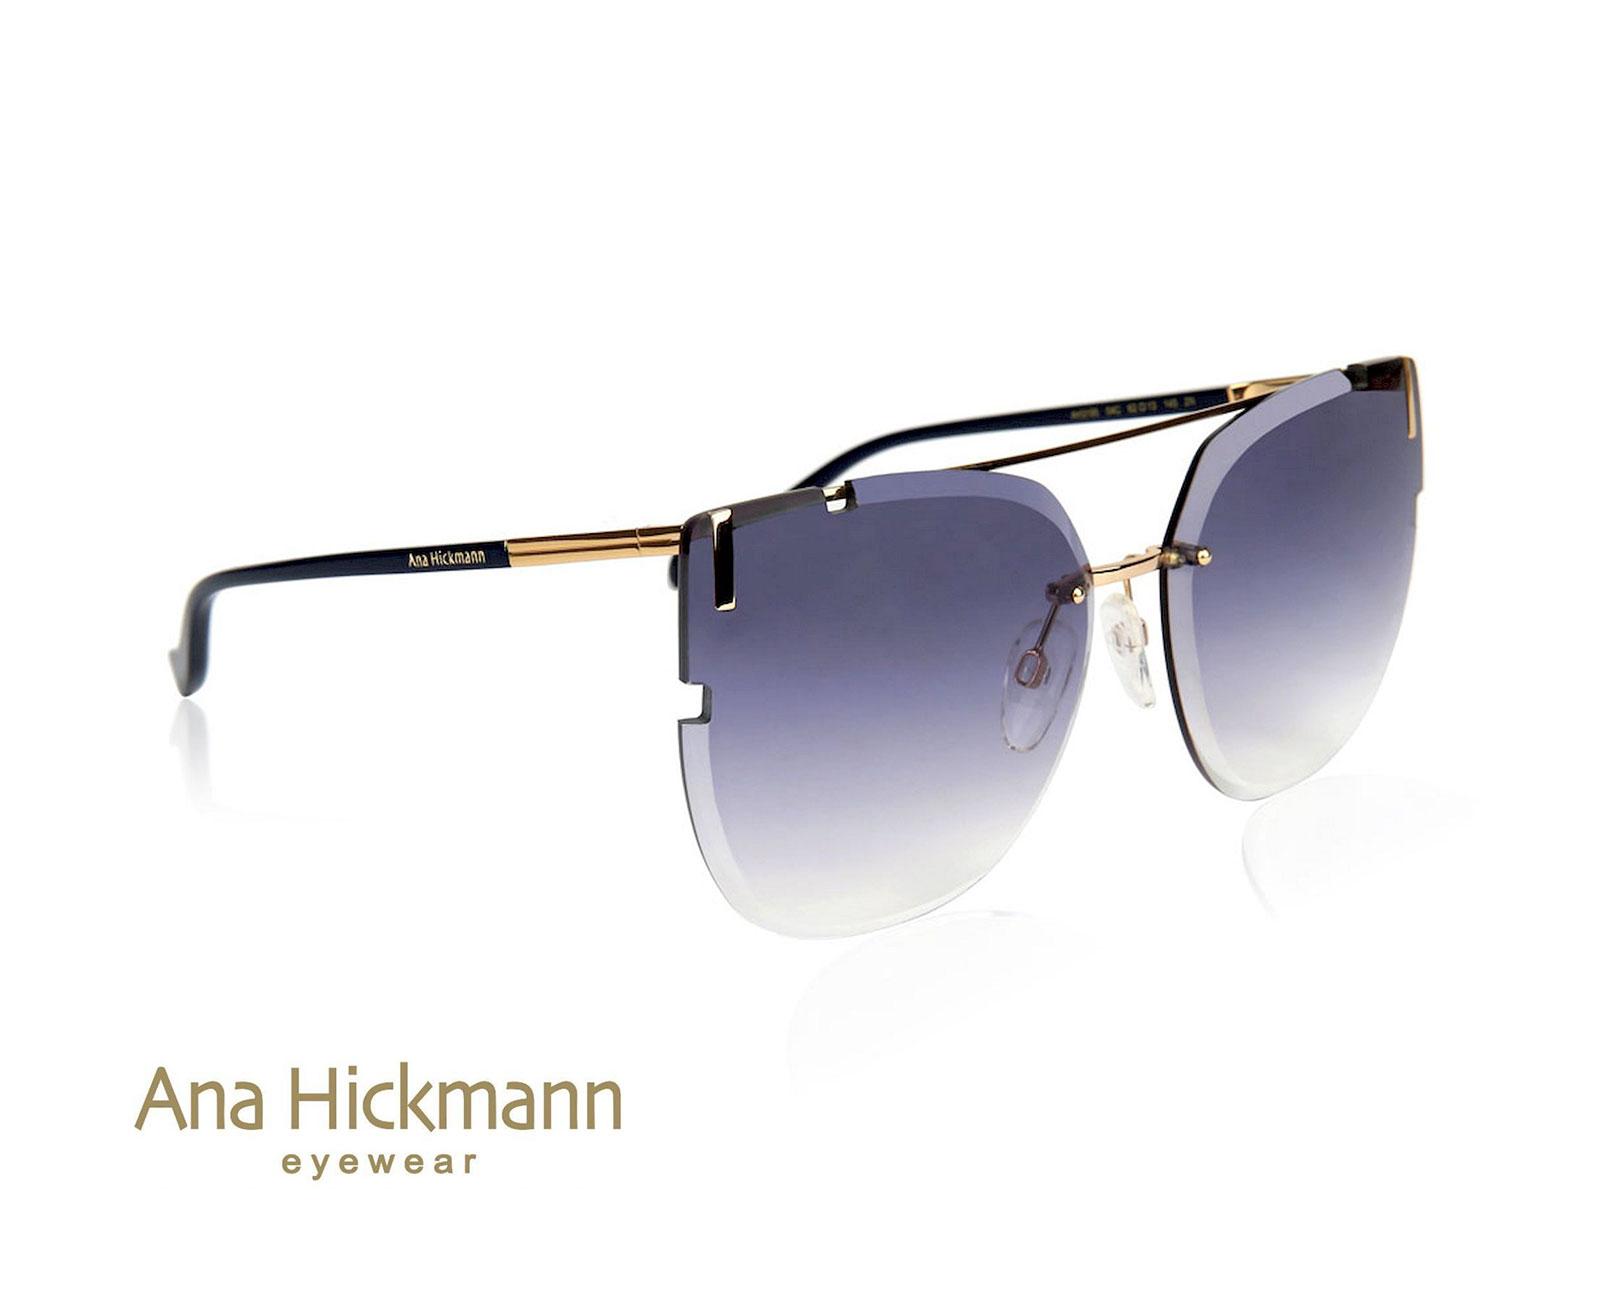 Ana Hickmann AH3195 in Gold